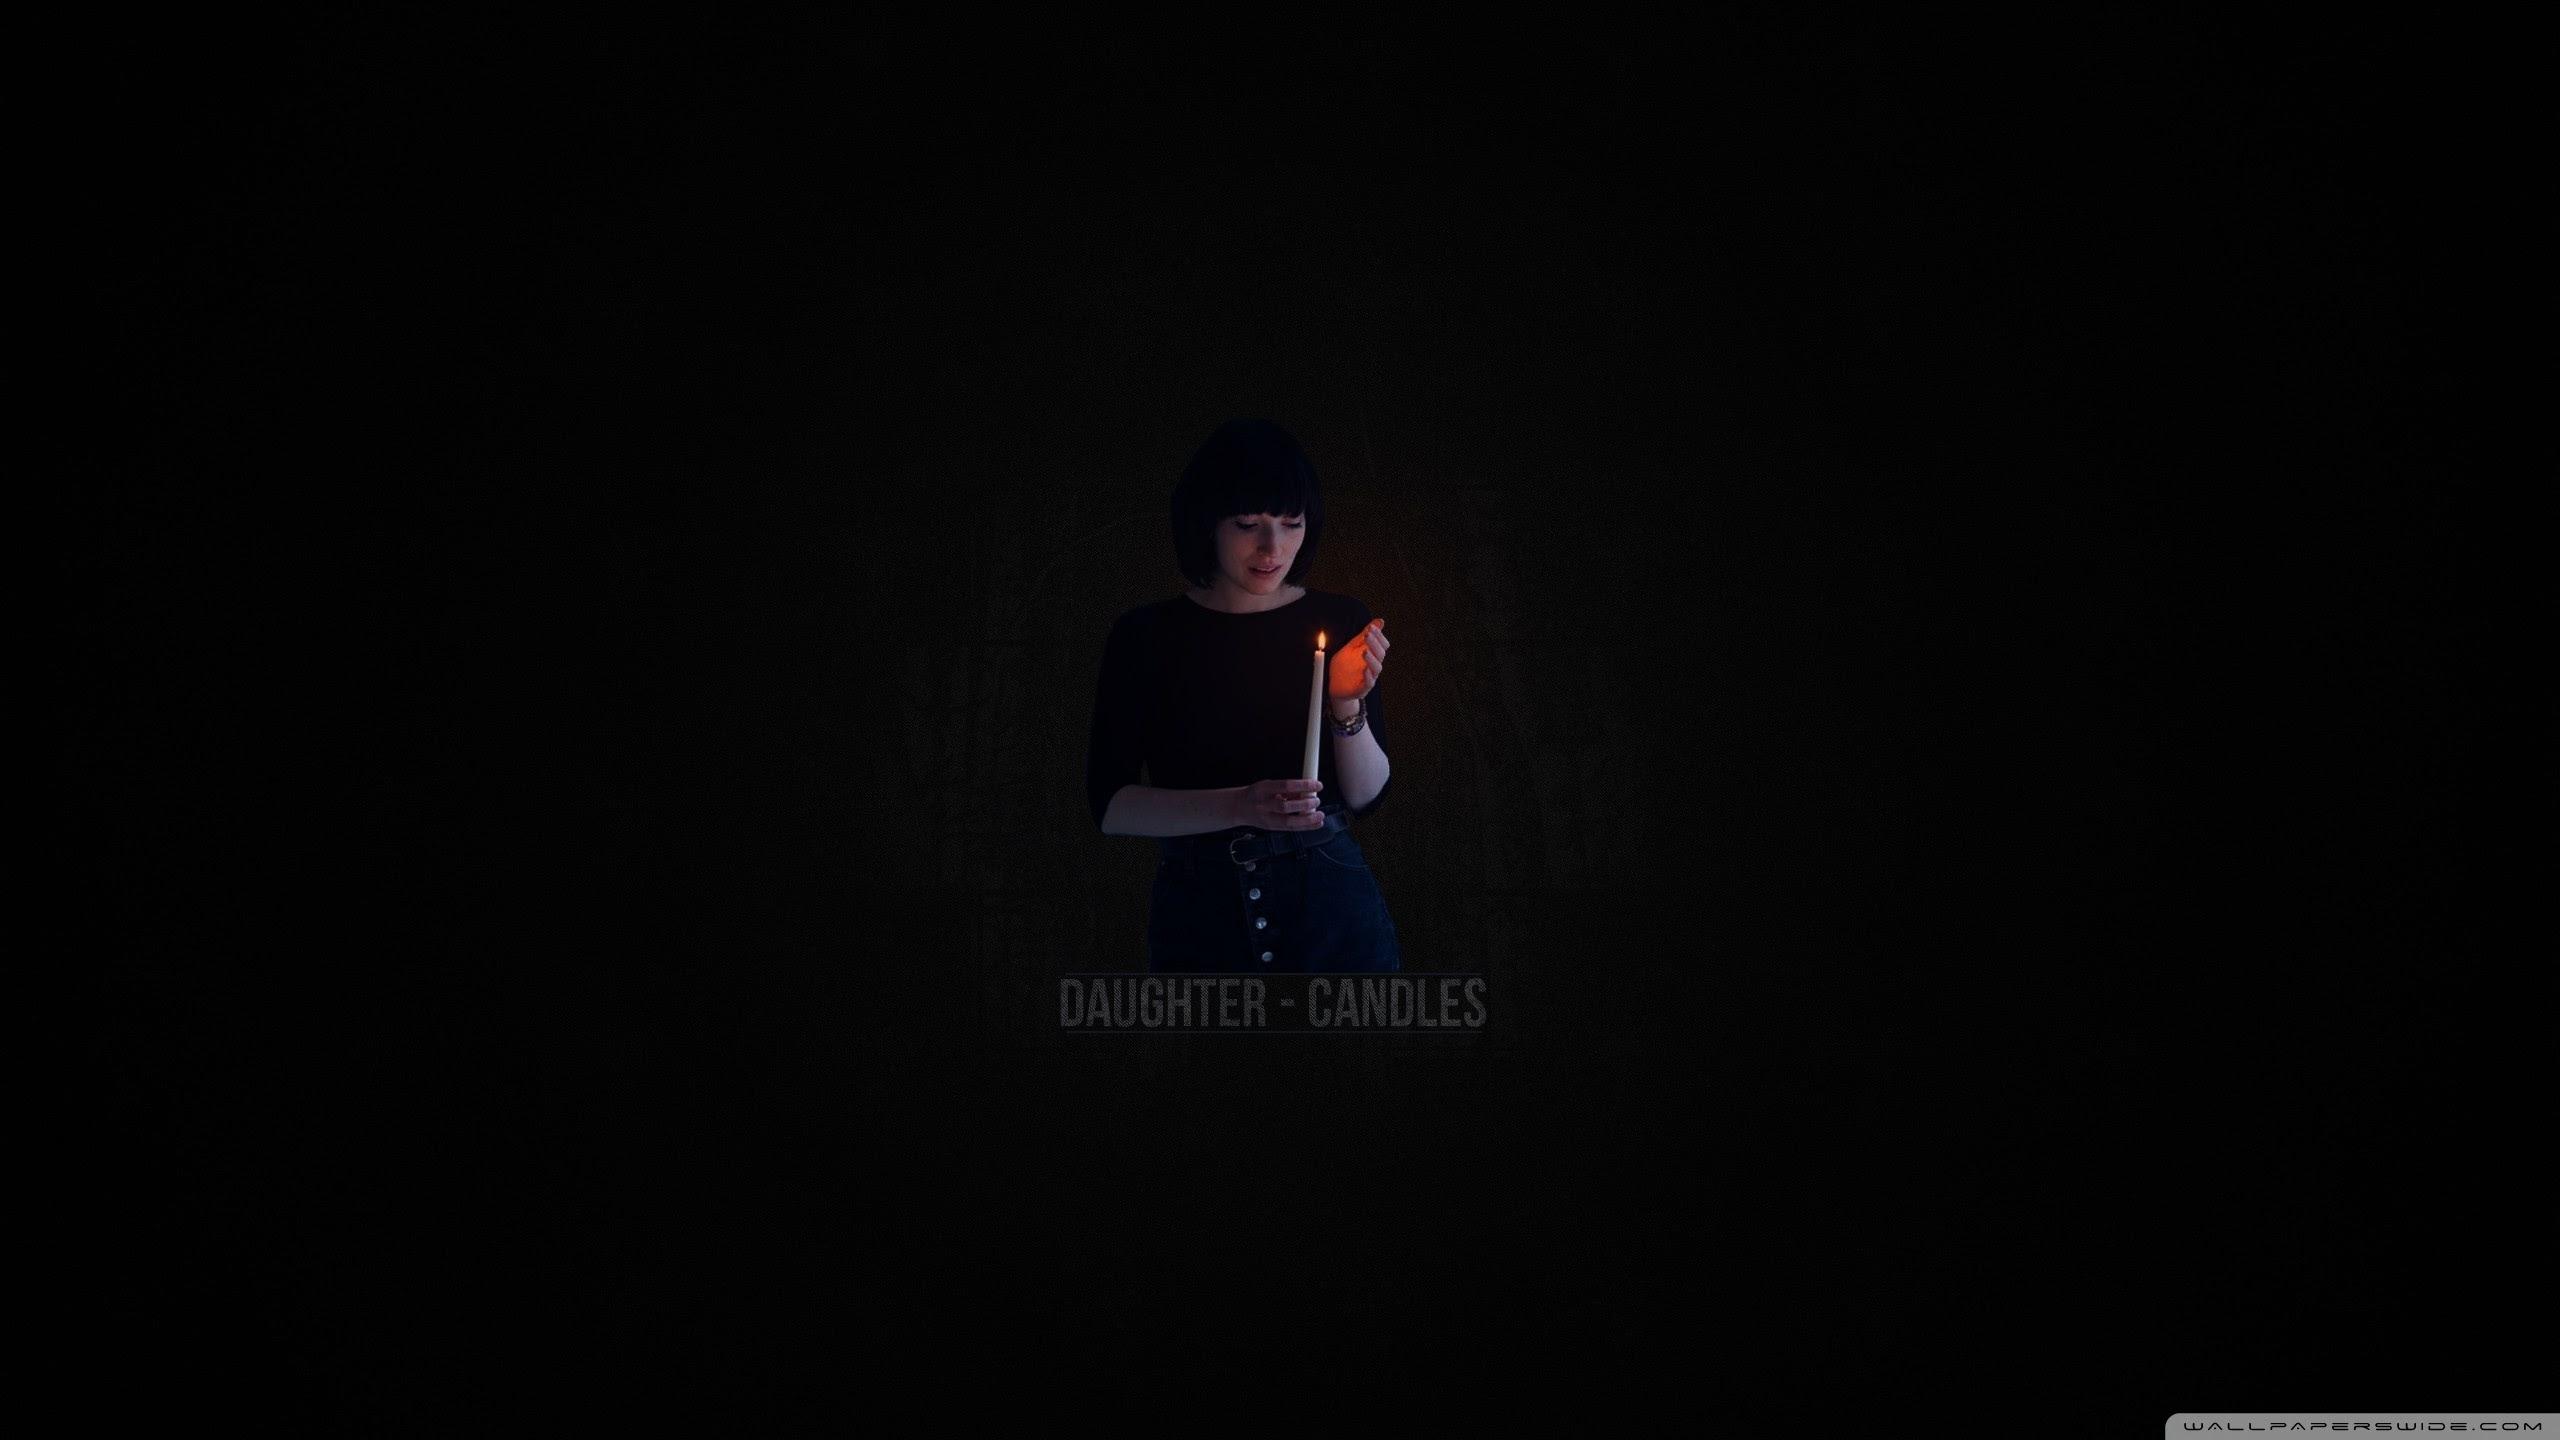 Elena Tonra Candles Ultra Hd Desktop Background Wallpaper For 4k